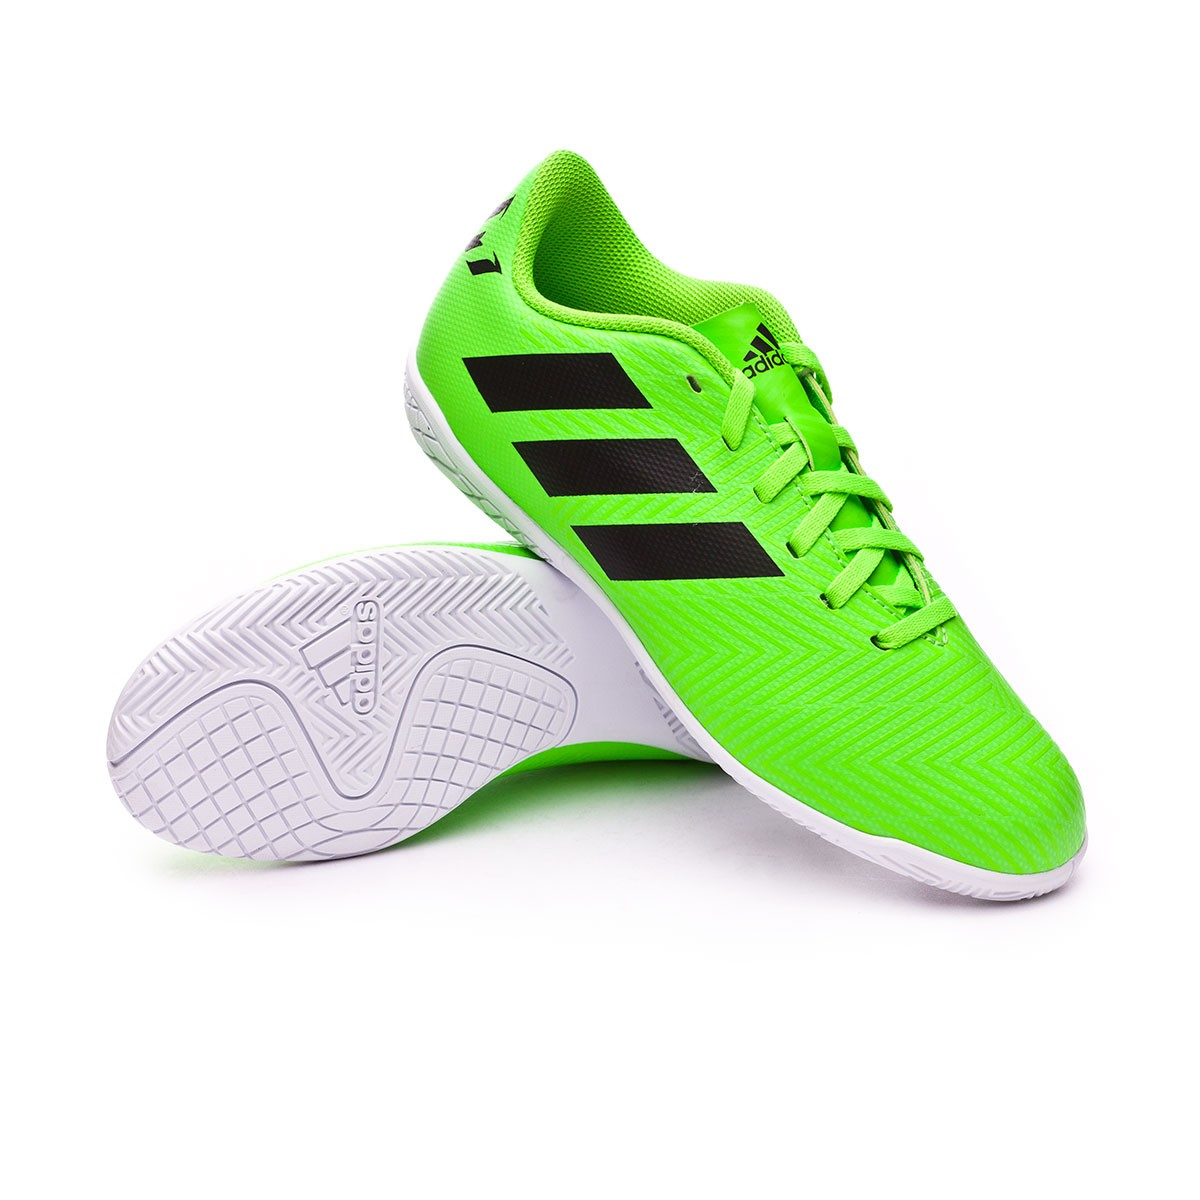 12a41b880 Futsal Boot adidas Kids Nemeziz Messi Tango 18.4 IN Solar green ...